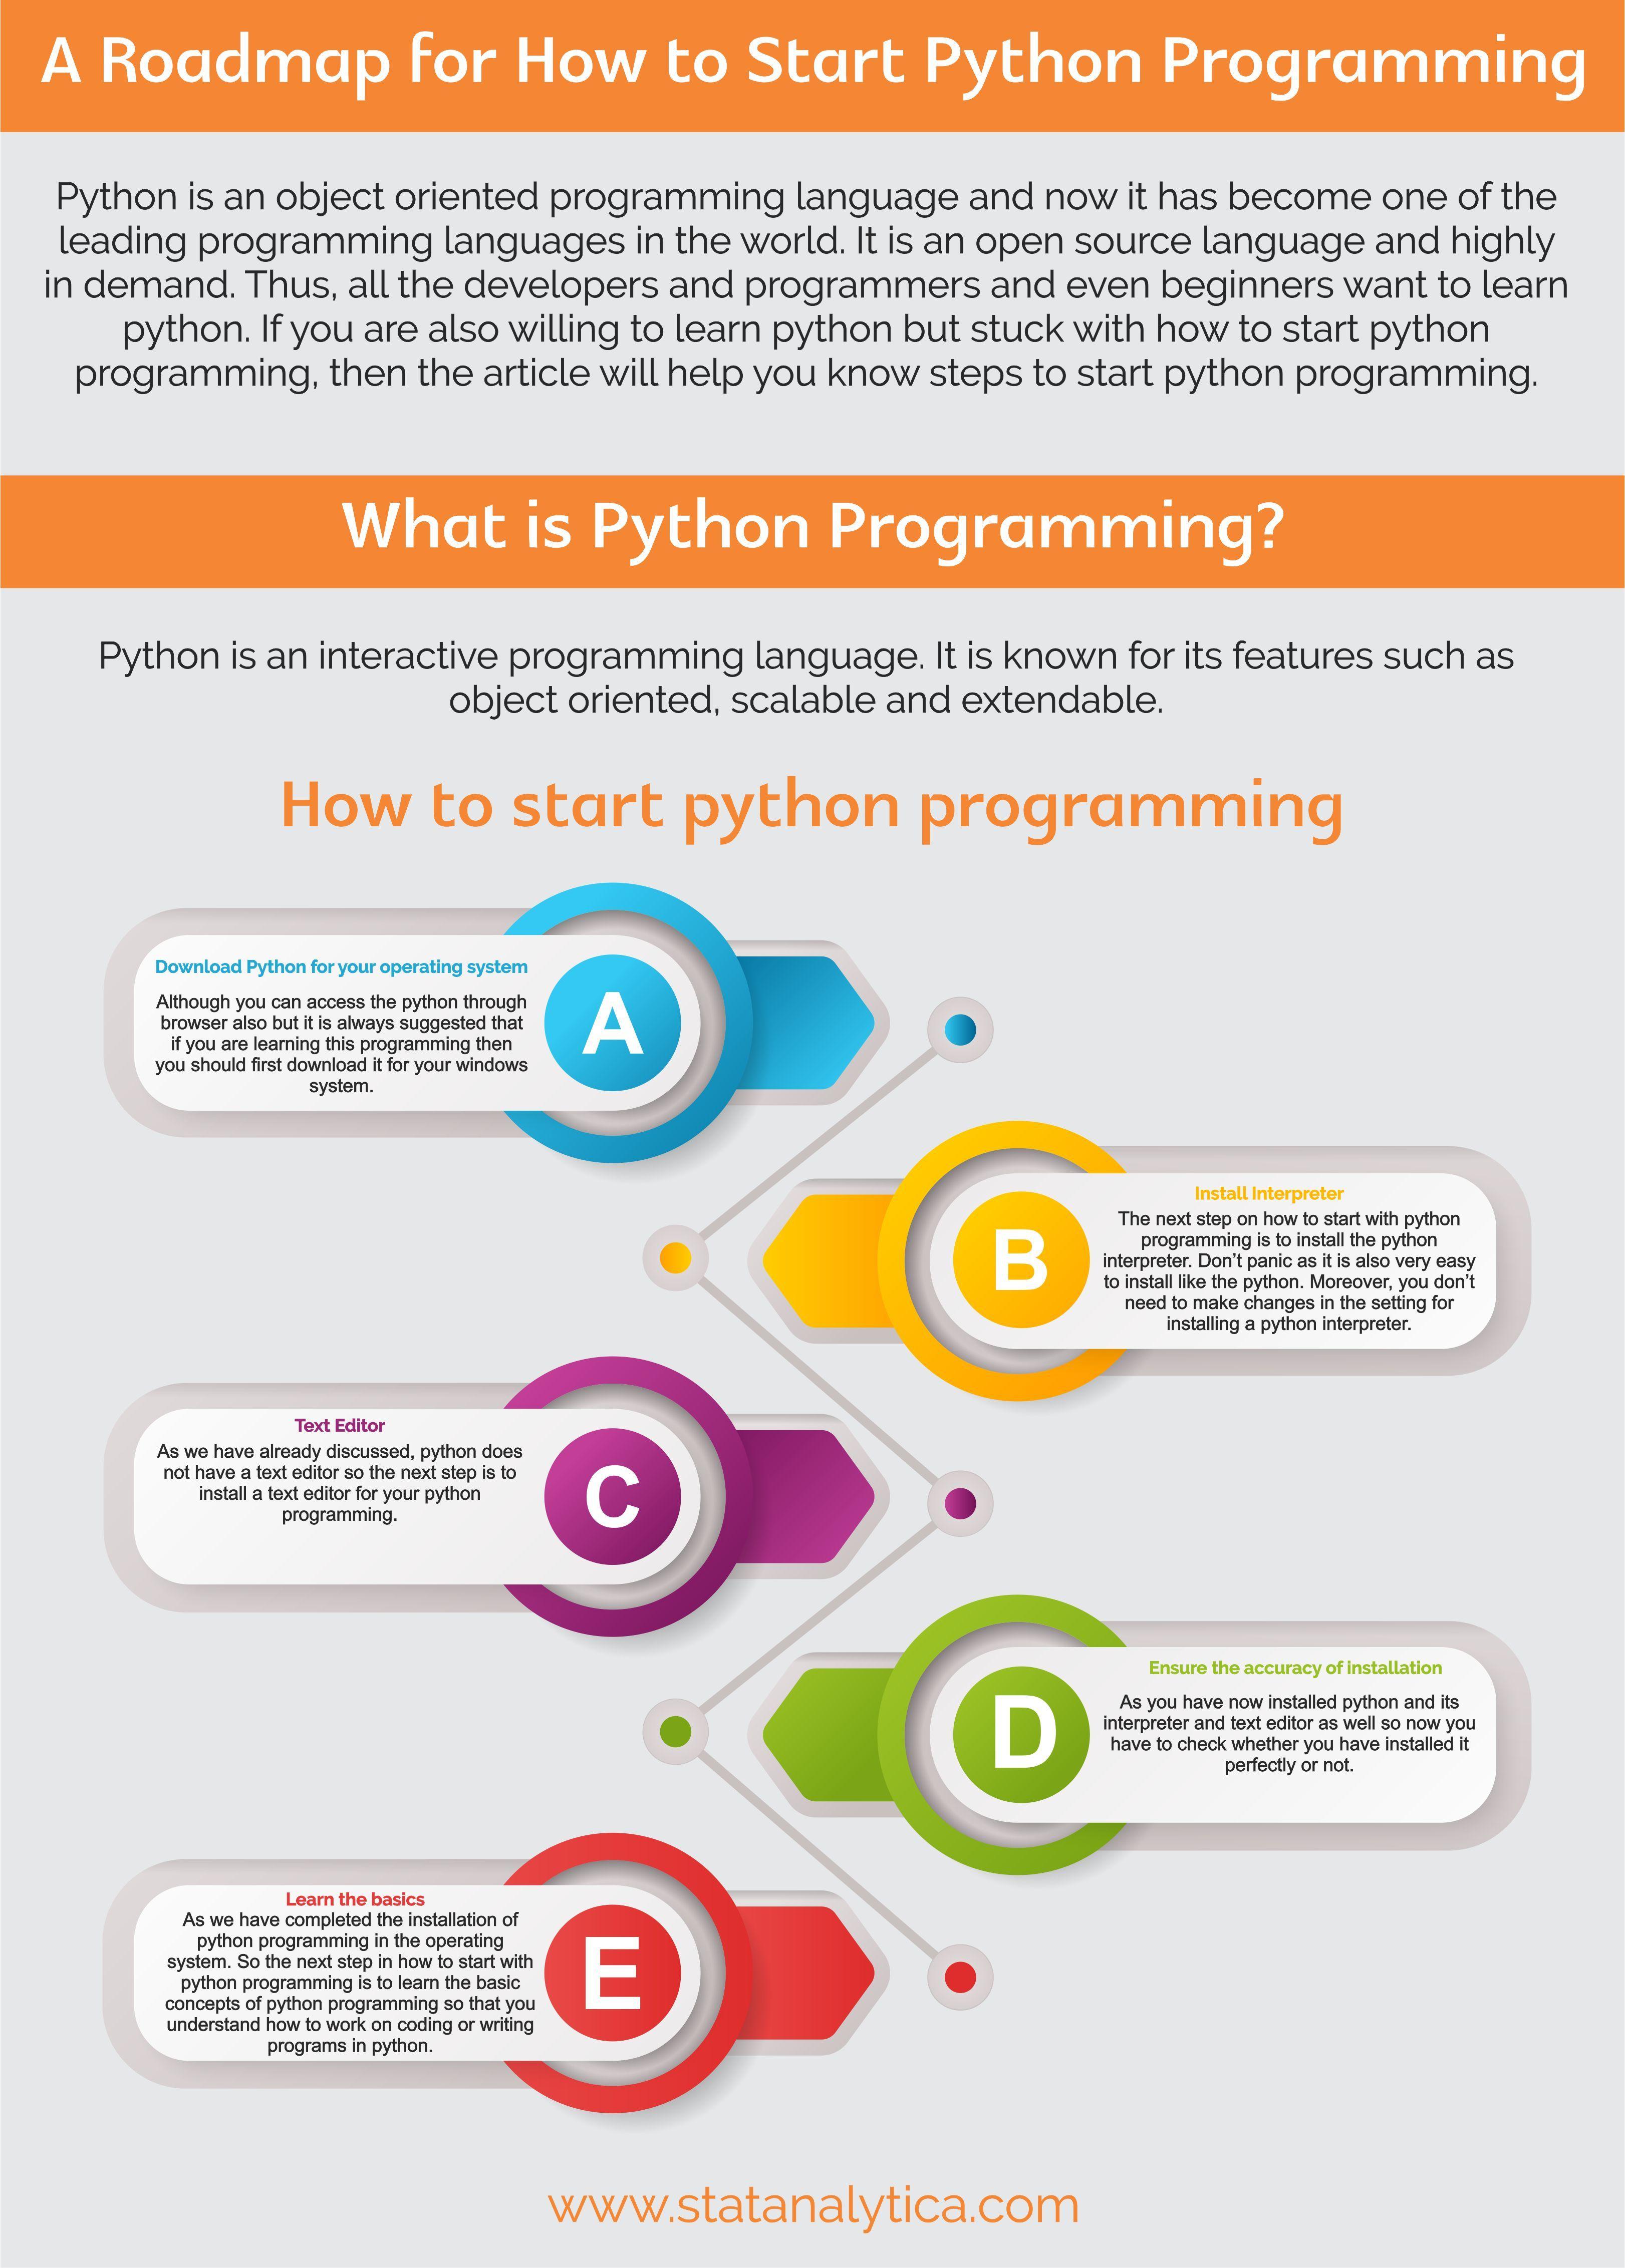 What Are The Best Resources To Start Learning Python Quora Programmazione Sviluppo Software Codifica